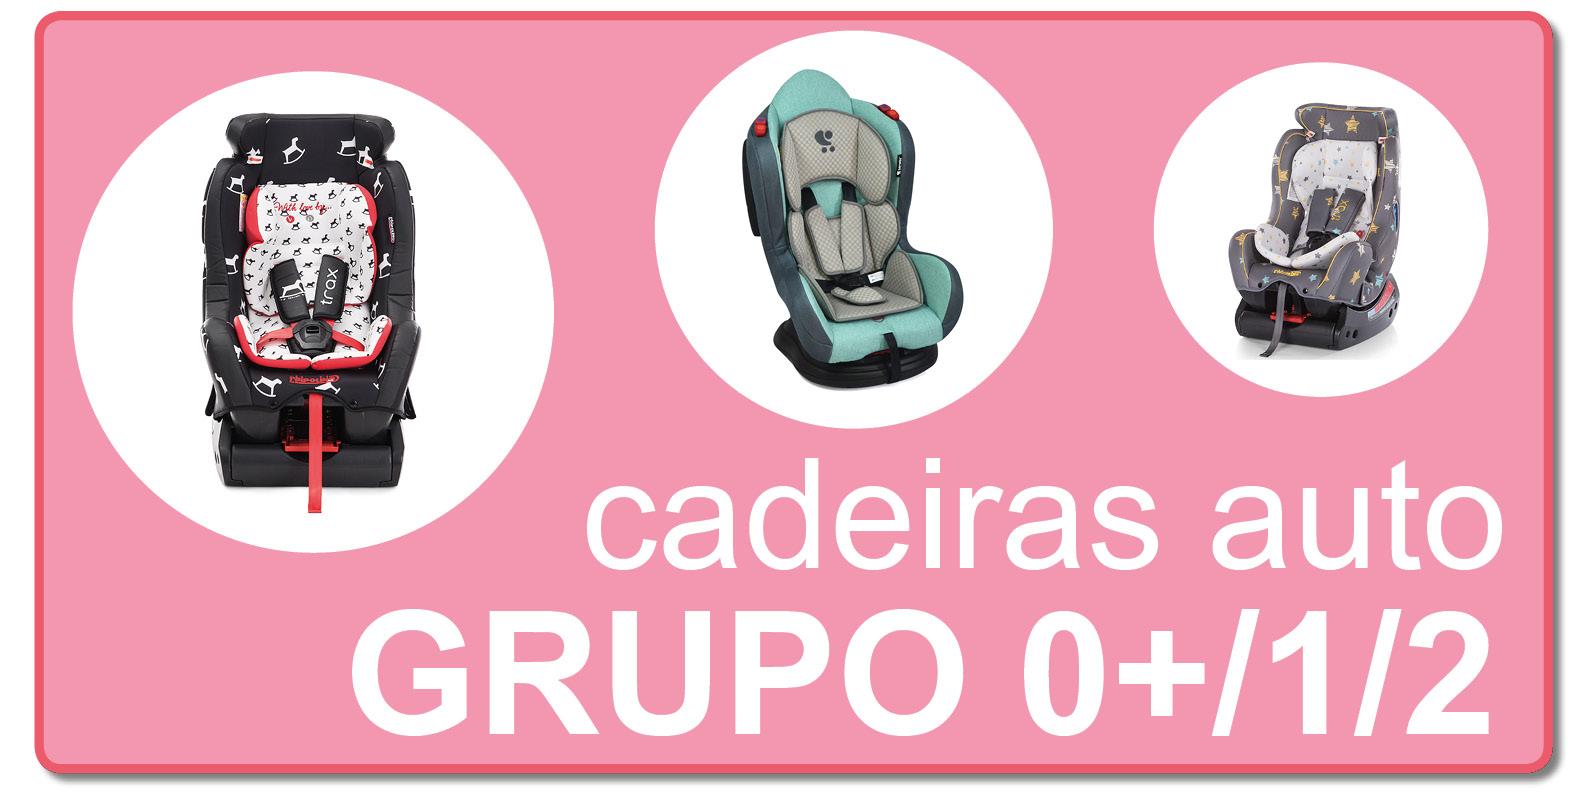 Cadeiras Auto Grupo 0+/1/2